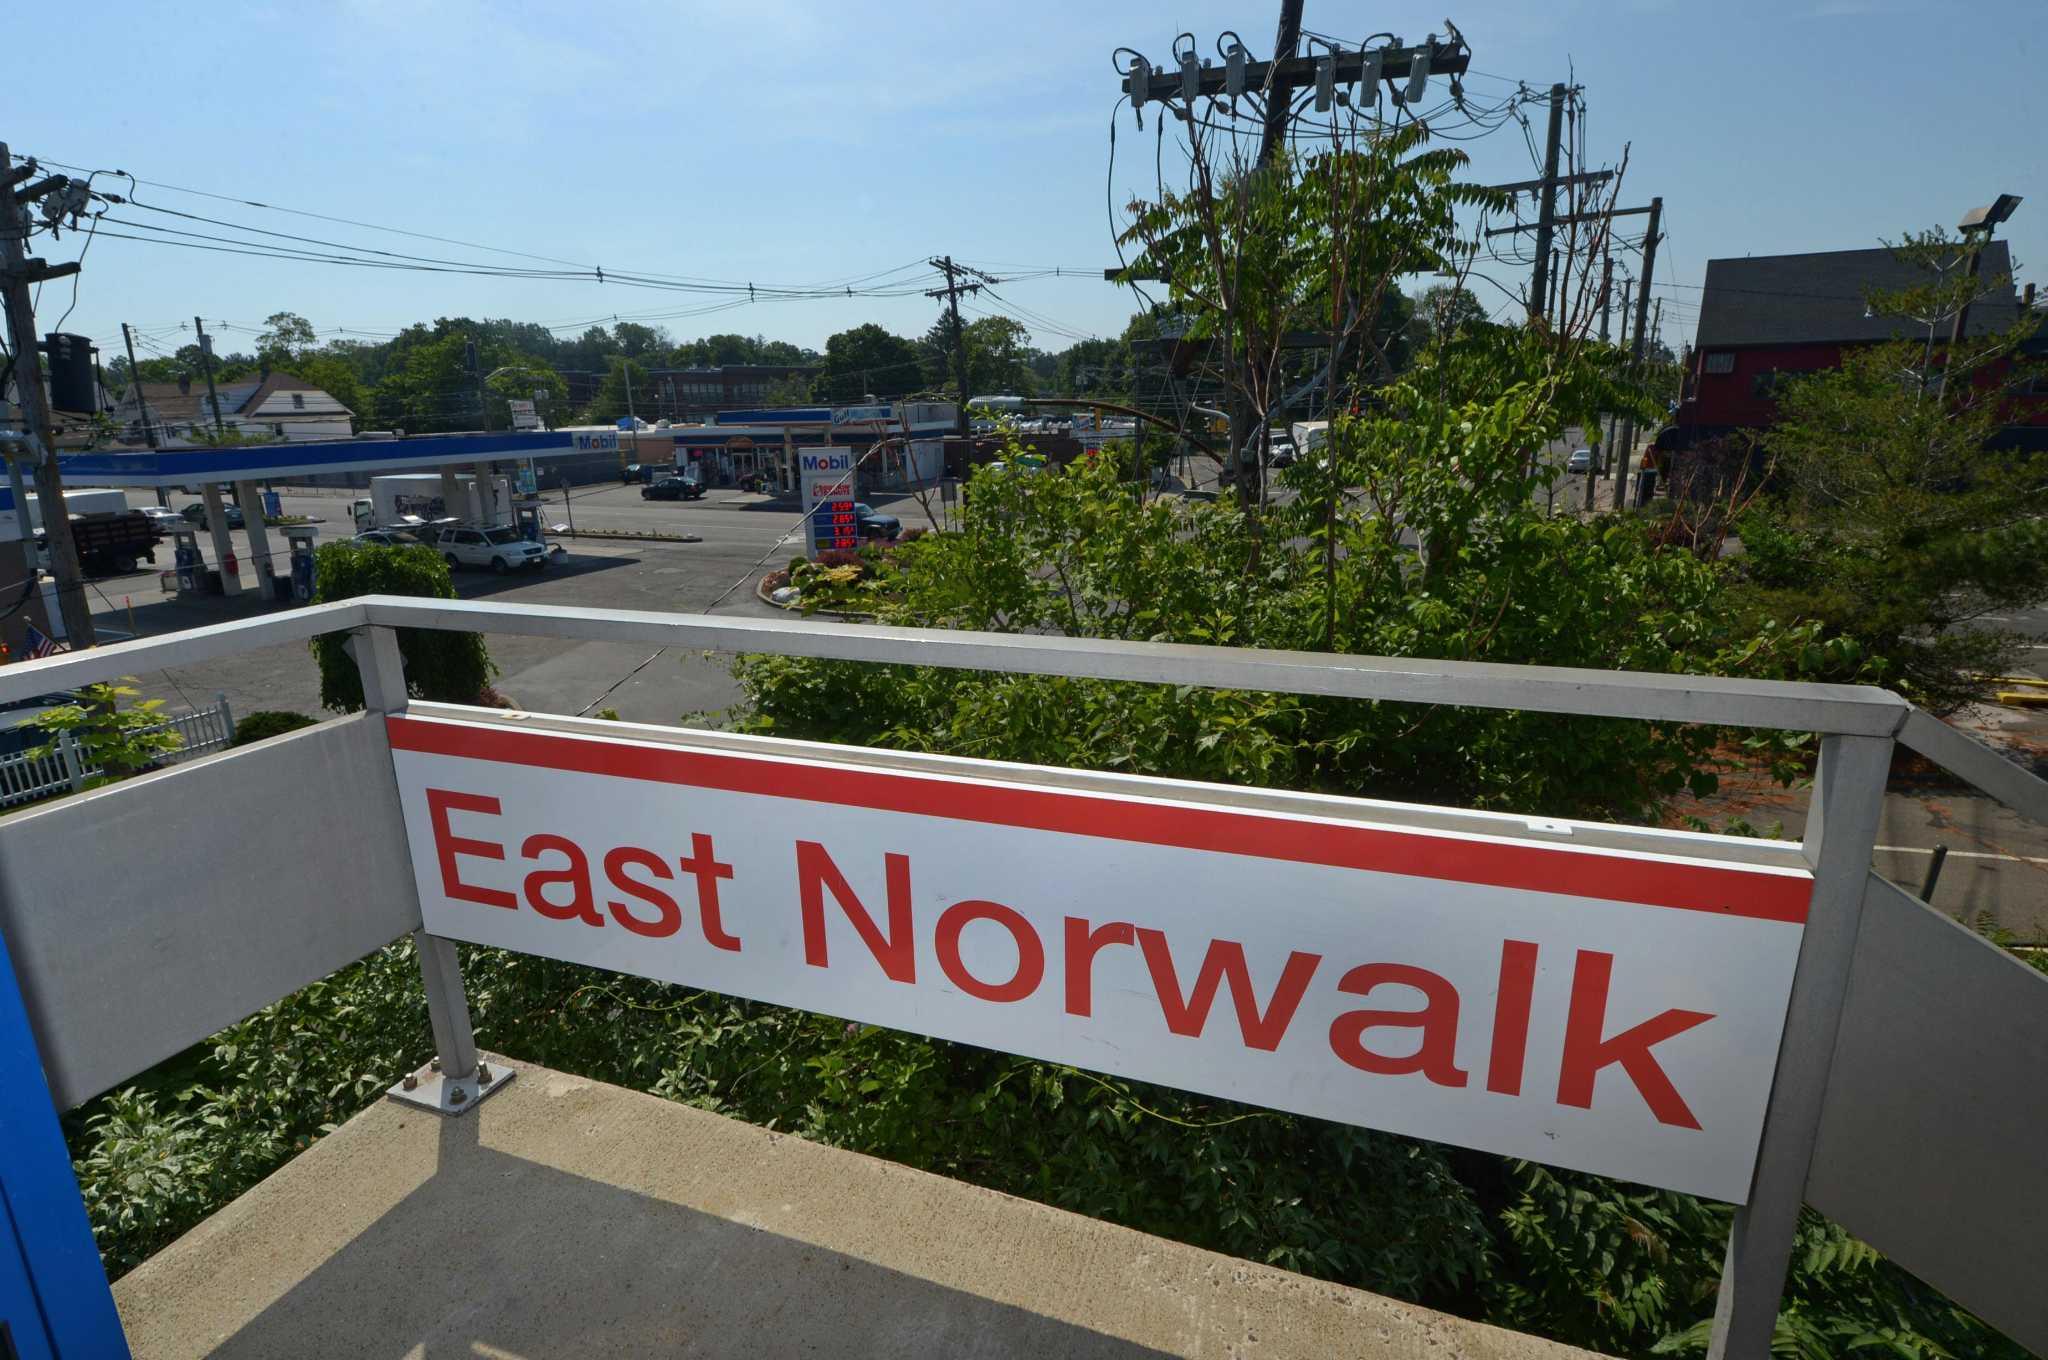 State Awards 125k To Develop East Norwalk Tod Plan